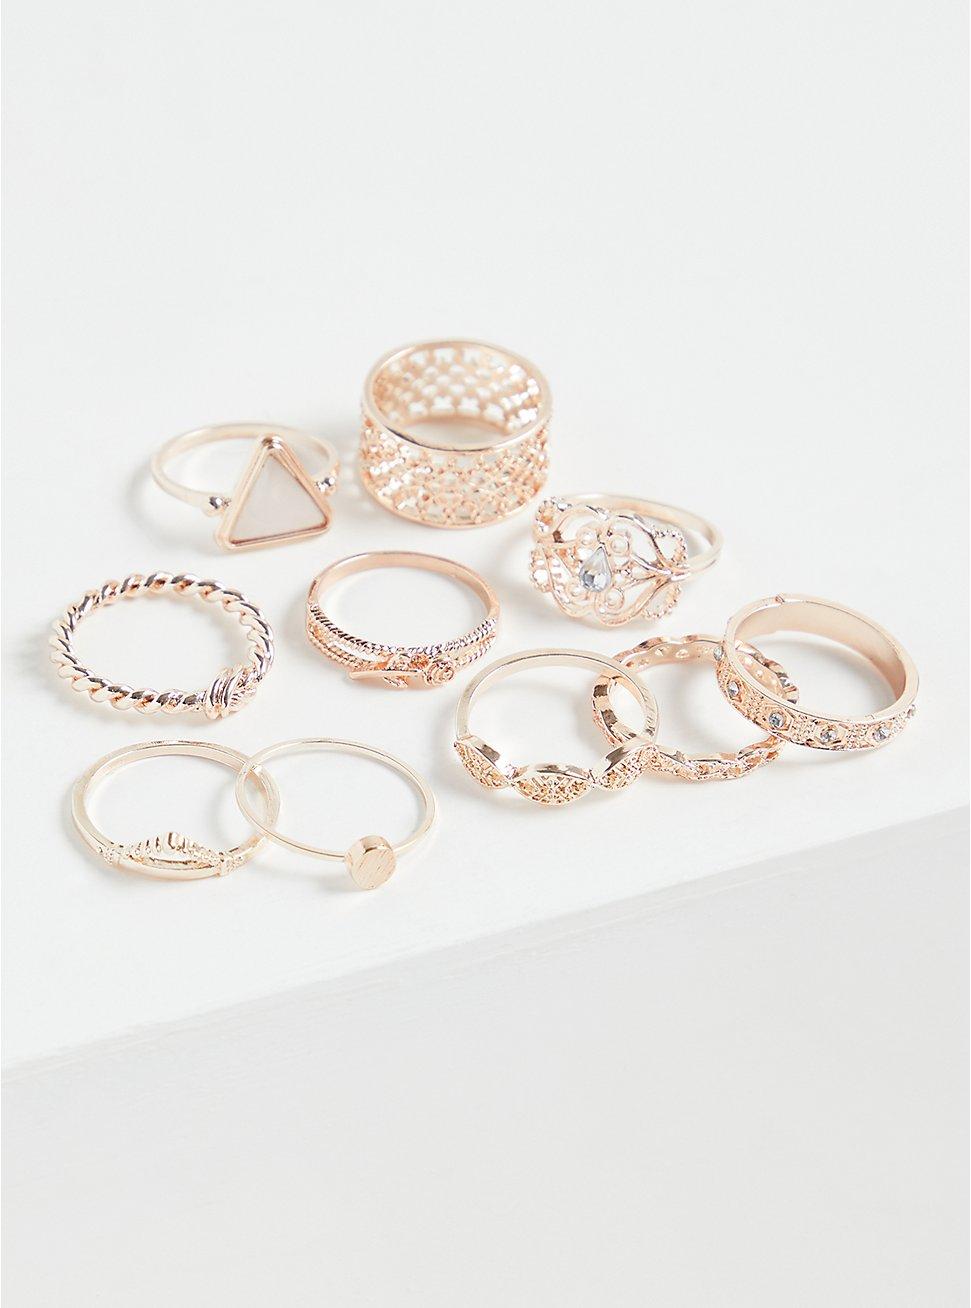 Plus Size Rose Gold-Tone Opal Ring Set - Set of 10, GOLD, hi-res